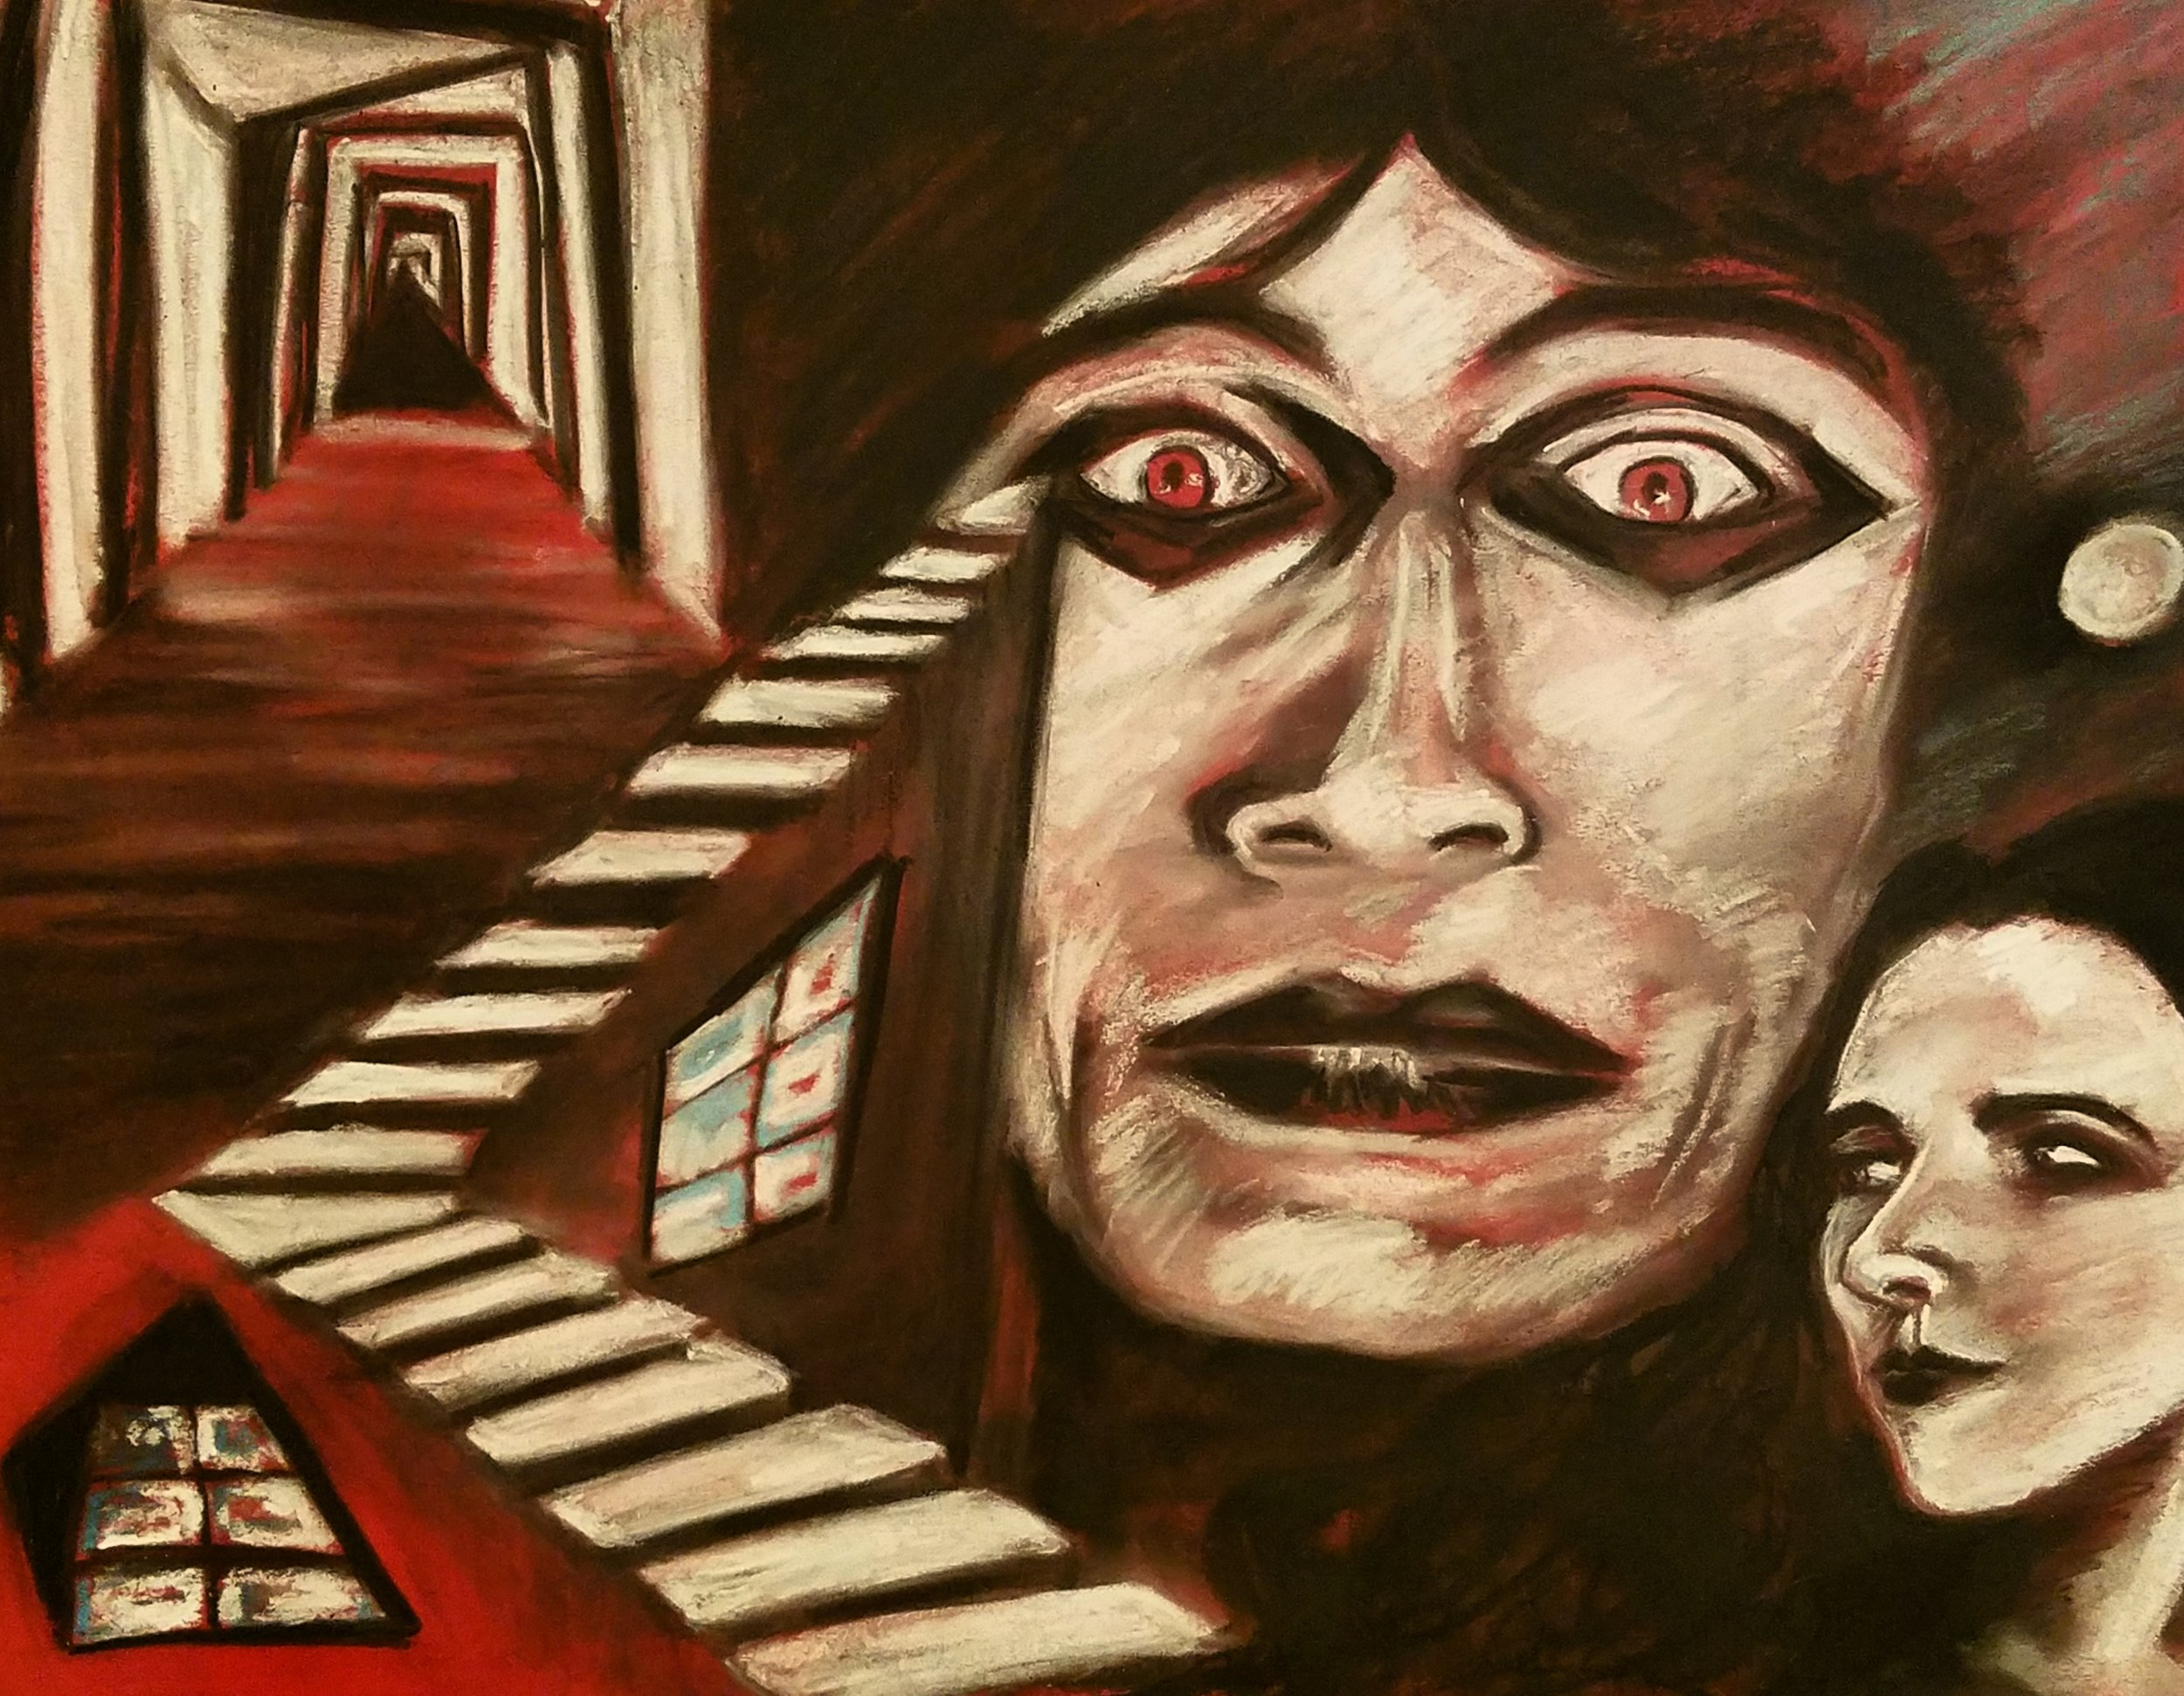 Original artwork by Samantha Buker / 7 Veils Studios, Baltimore